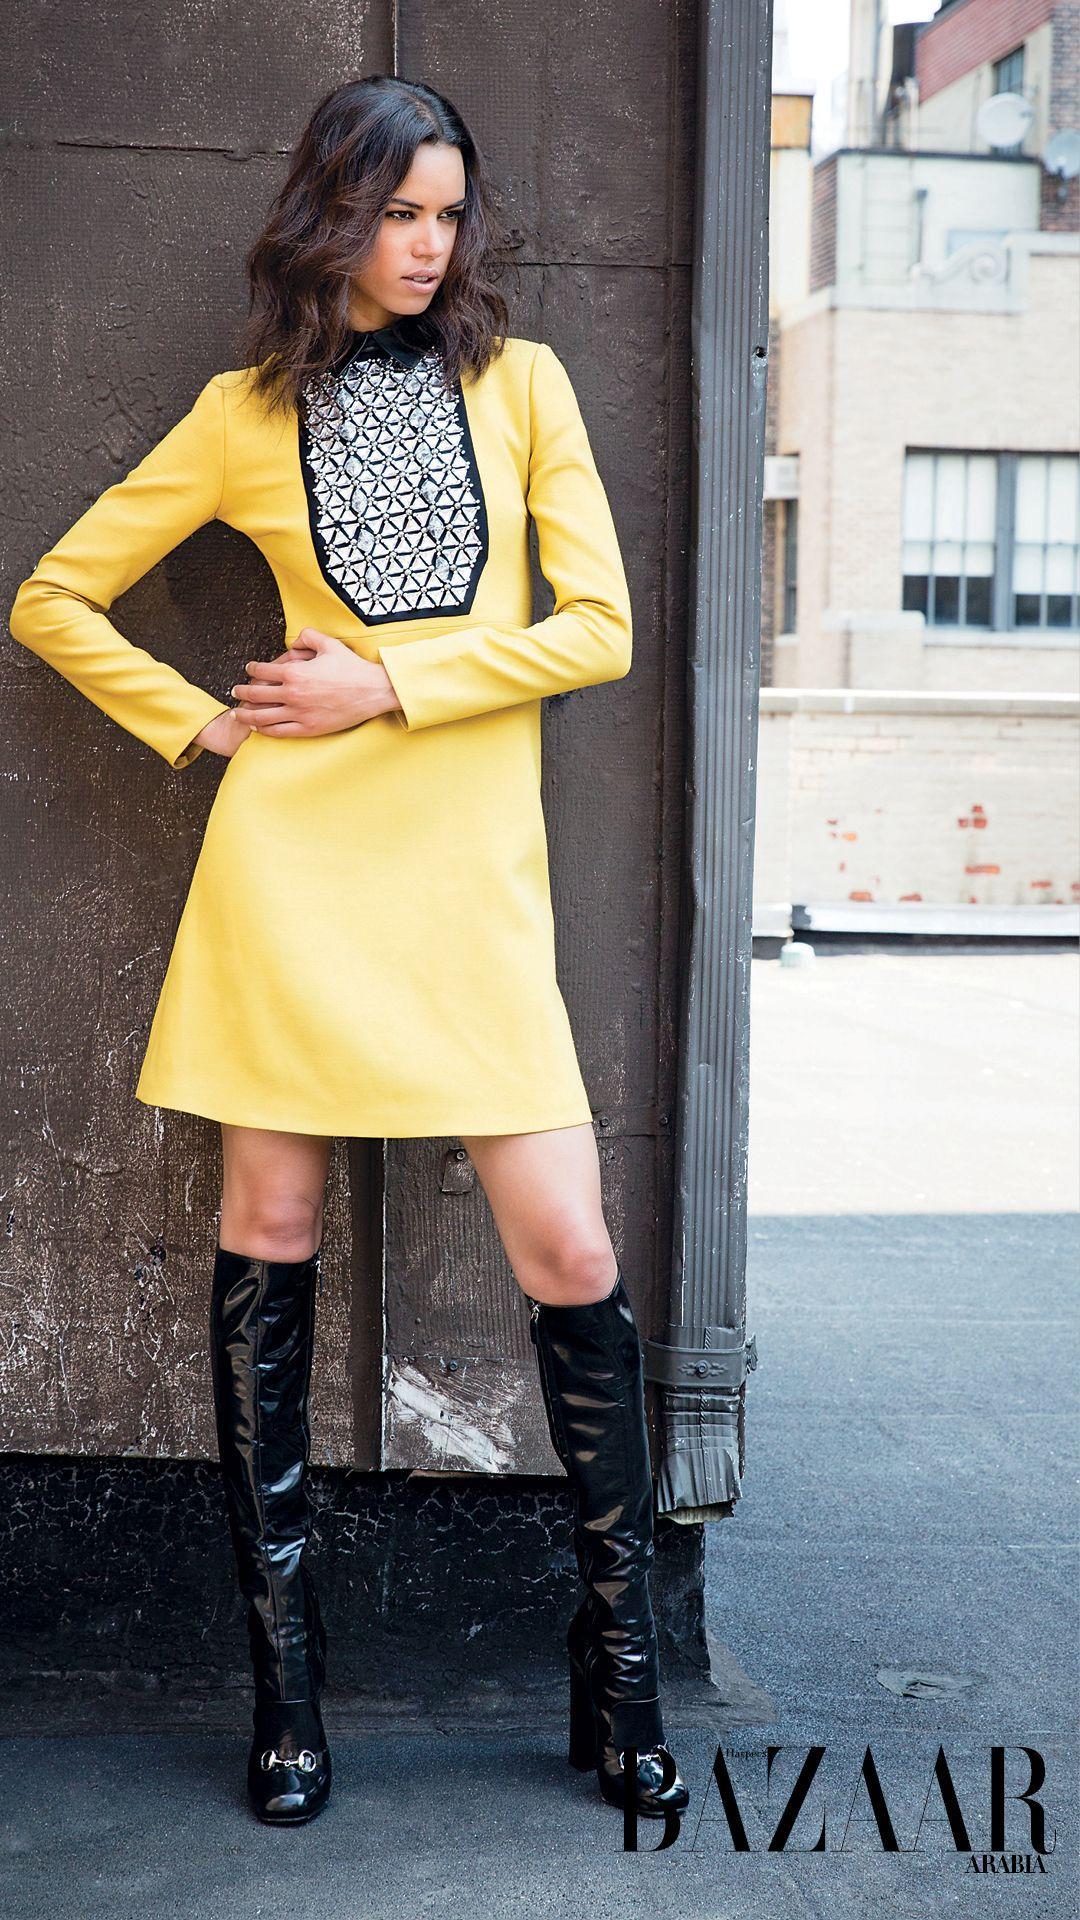 Hind Sahli for Harper's Bazaar